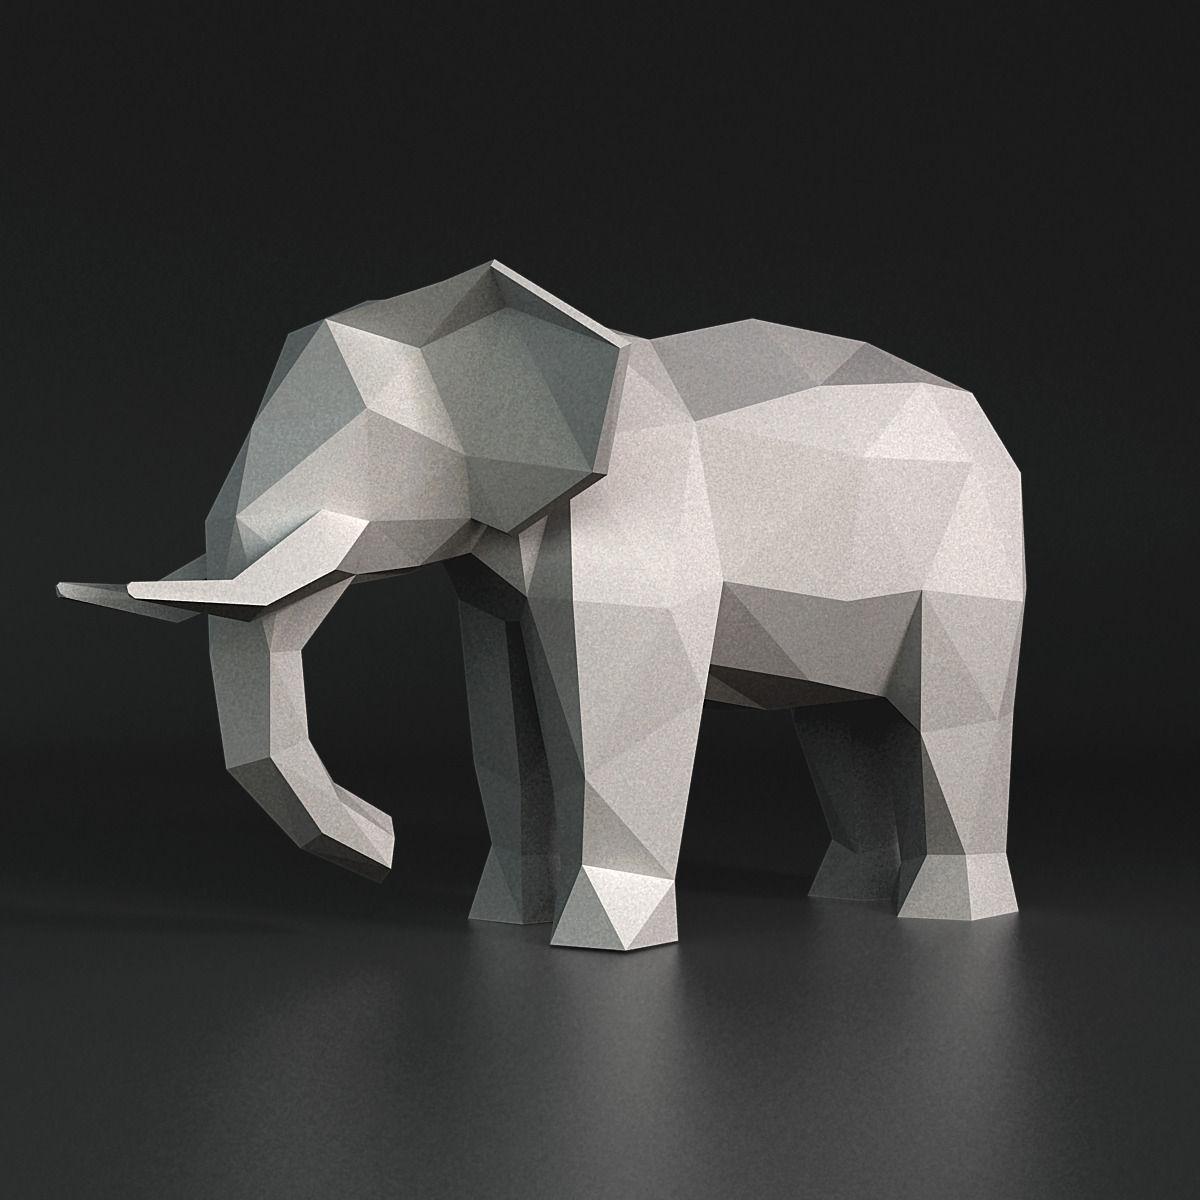 Lowpoly Elephant Sculpture 3d Model Obj 3ds Stl 9